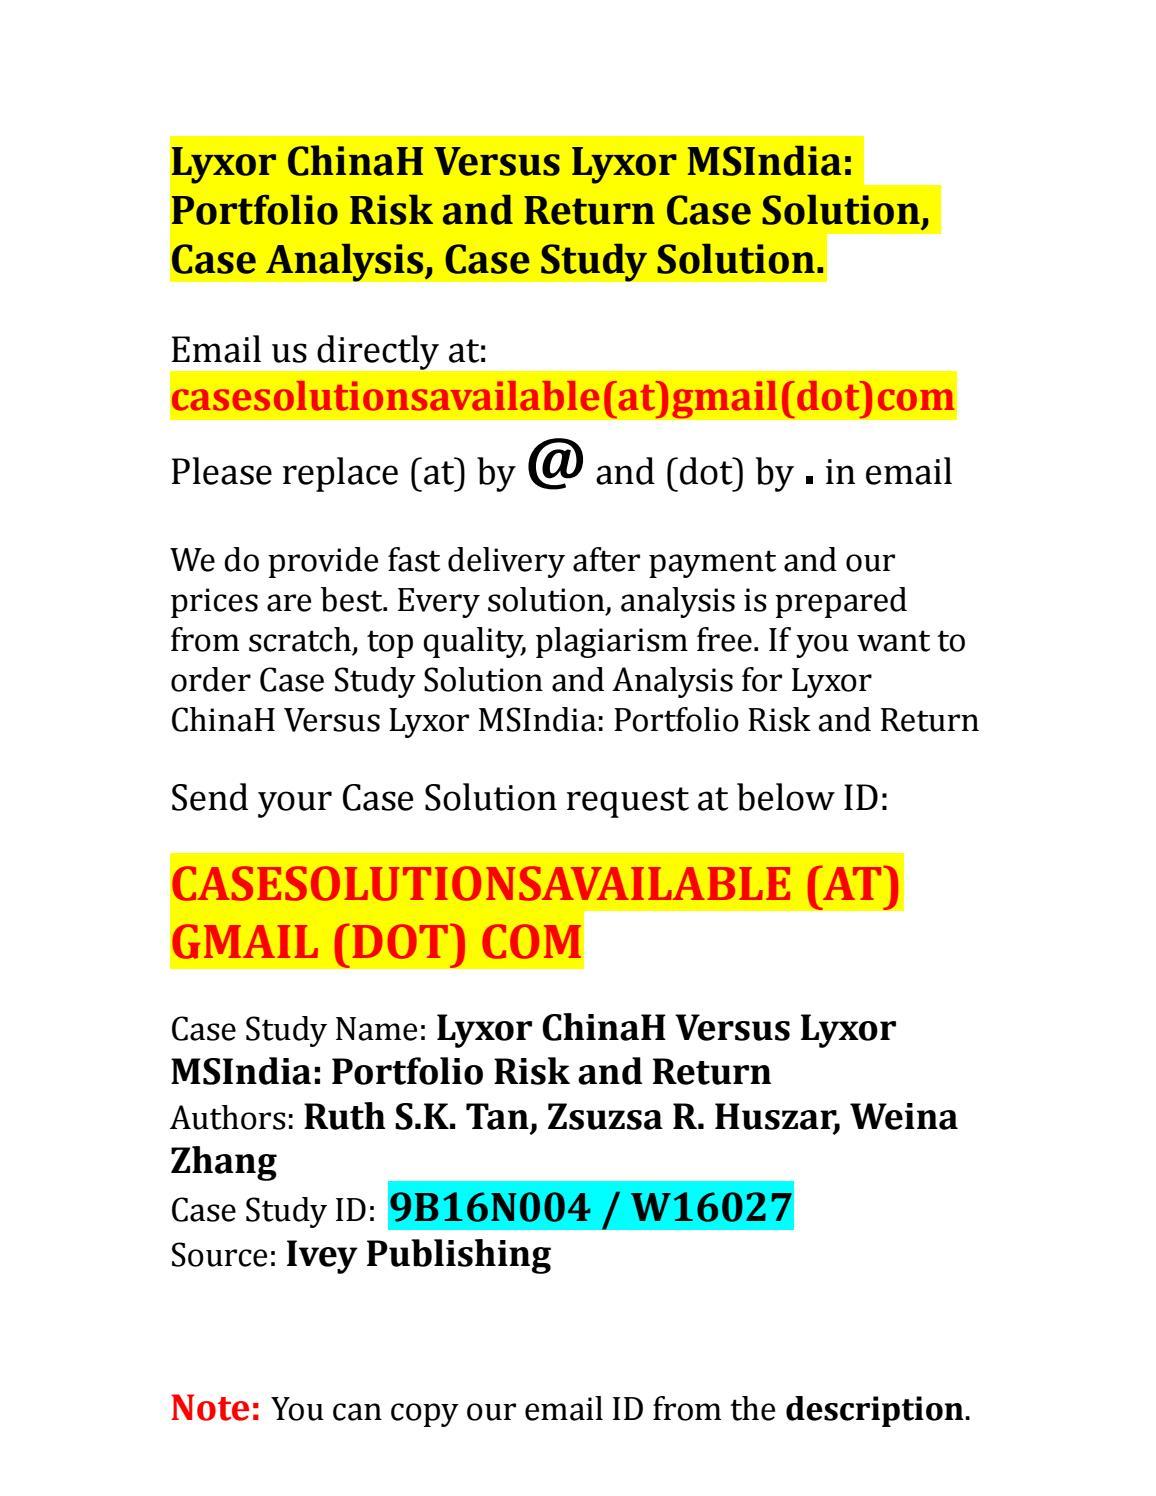 Case solution for lyxor chinah versus lyxor msindia portfolio risk